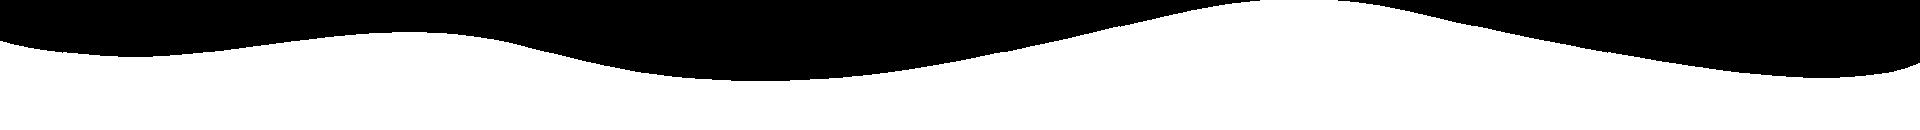 bottom-banner-graphic